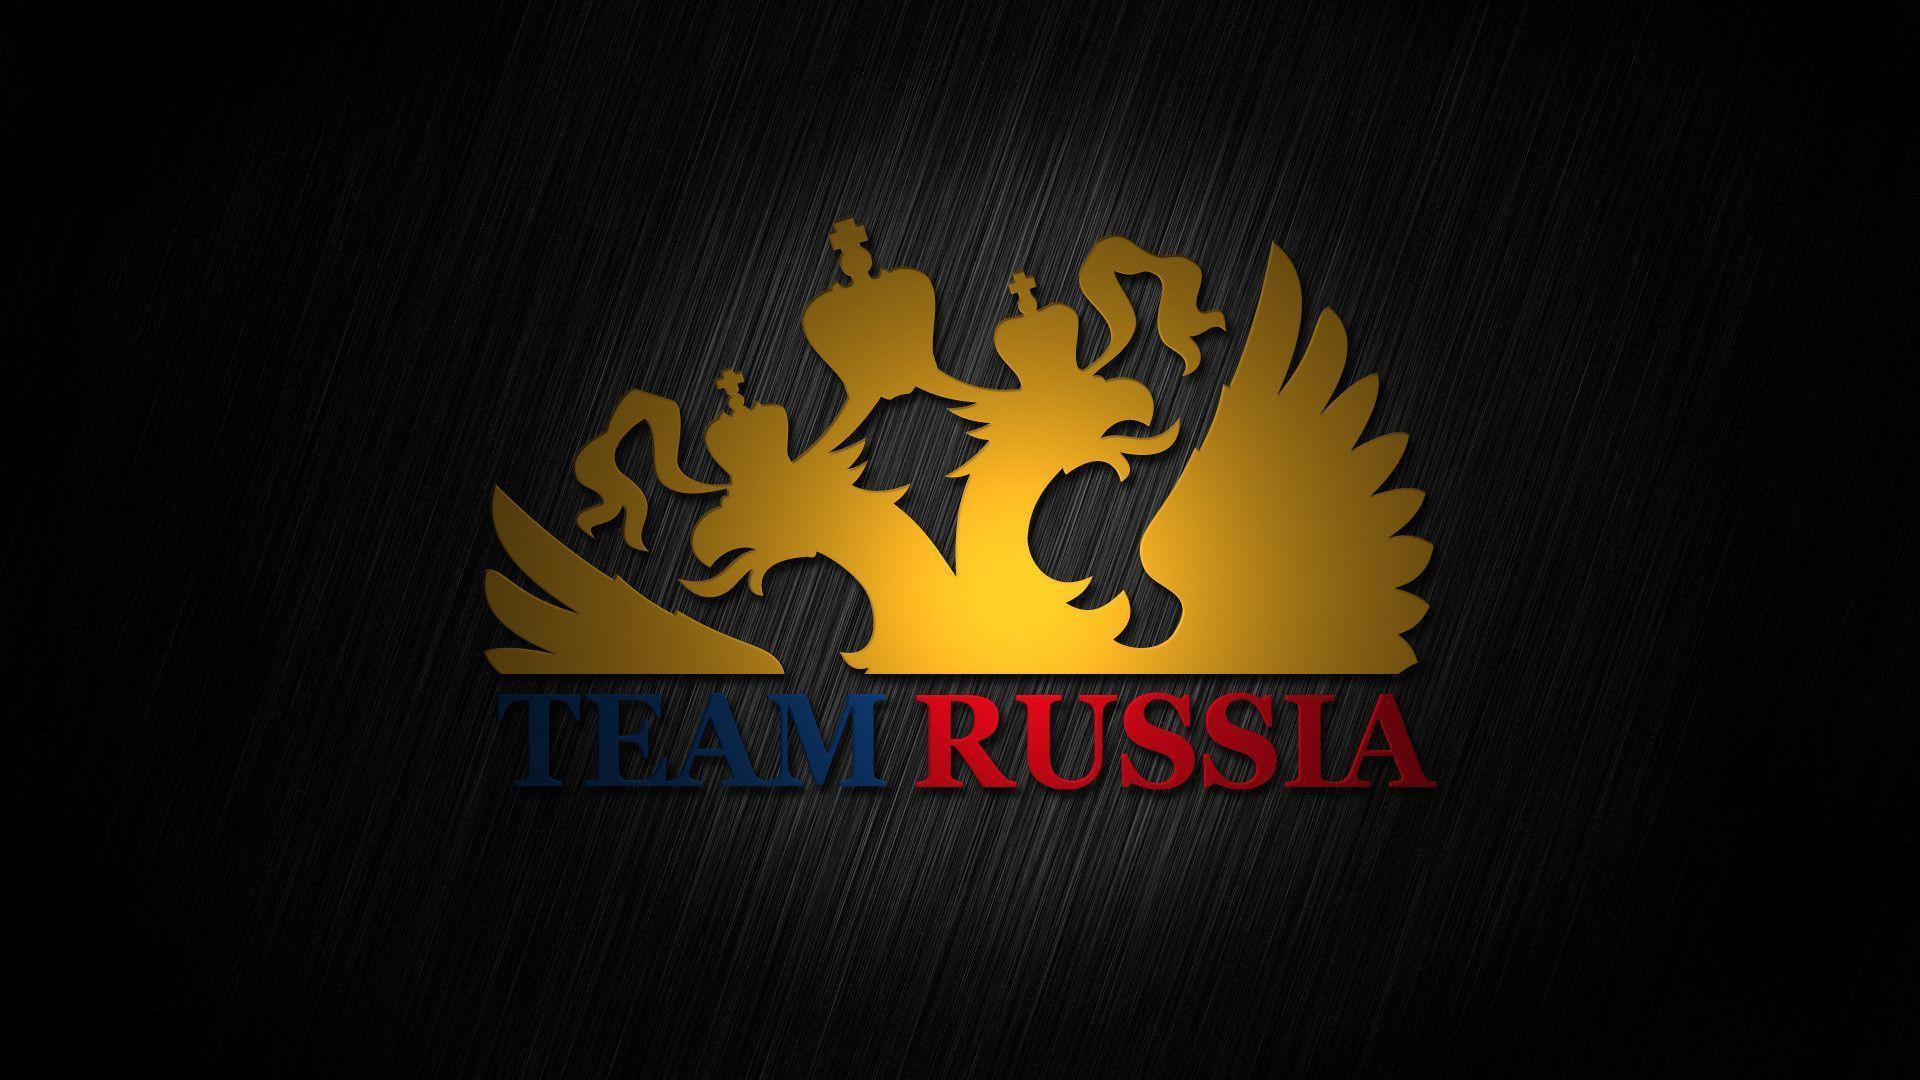 Герб флаг фото россии 6